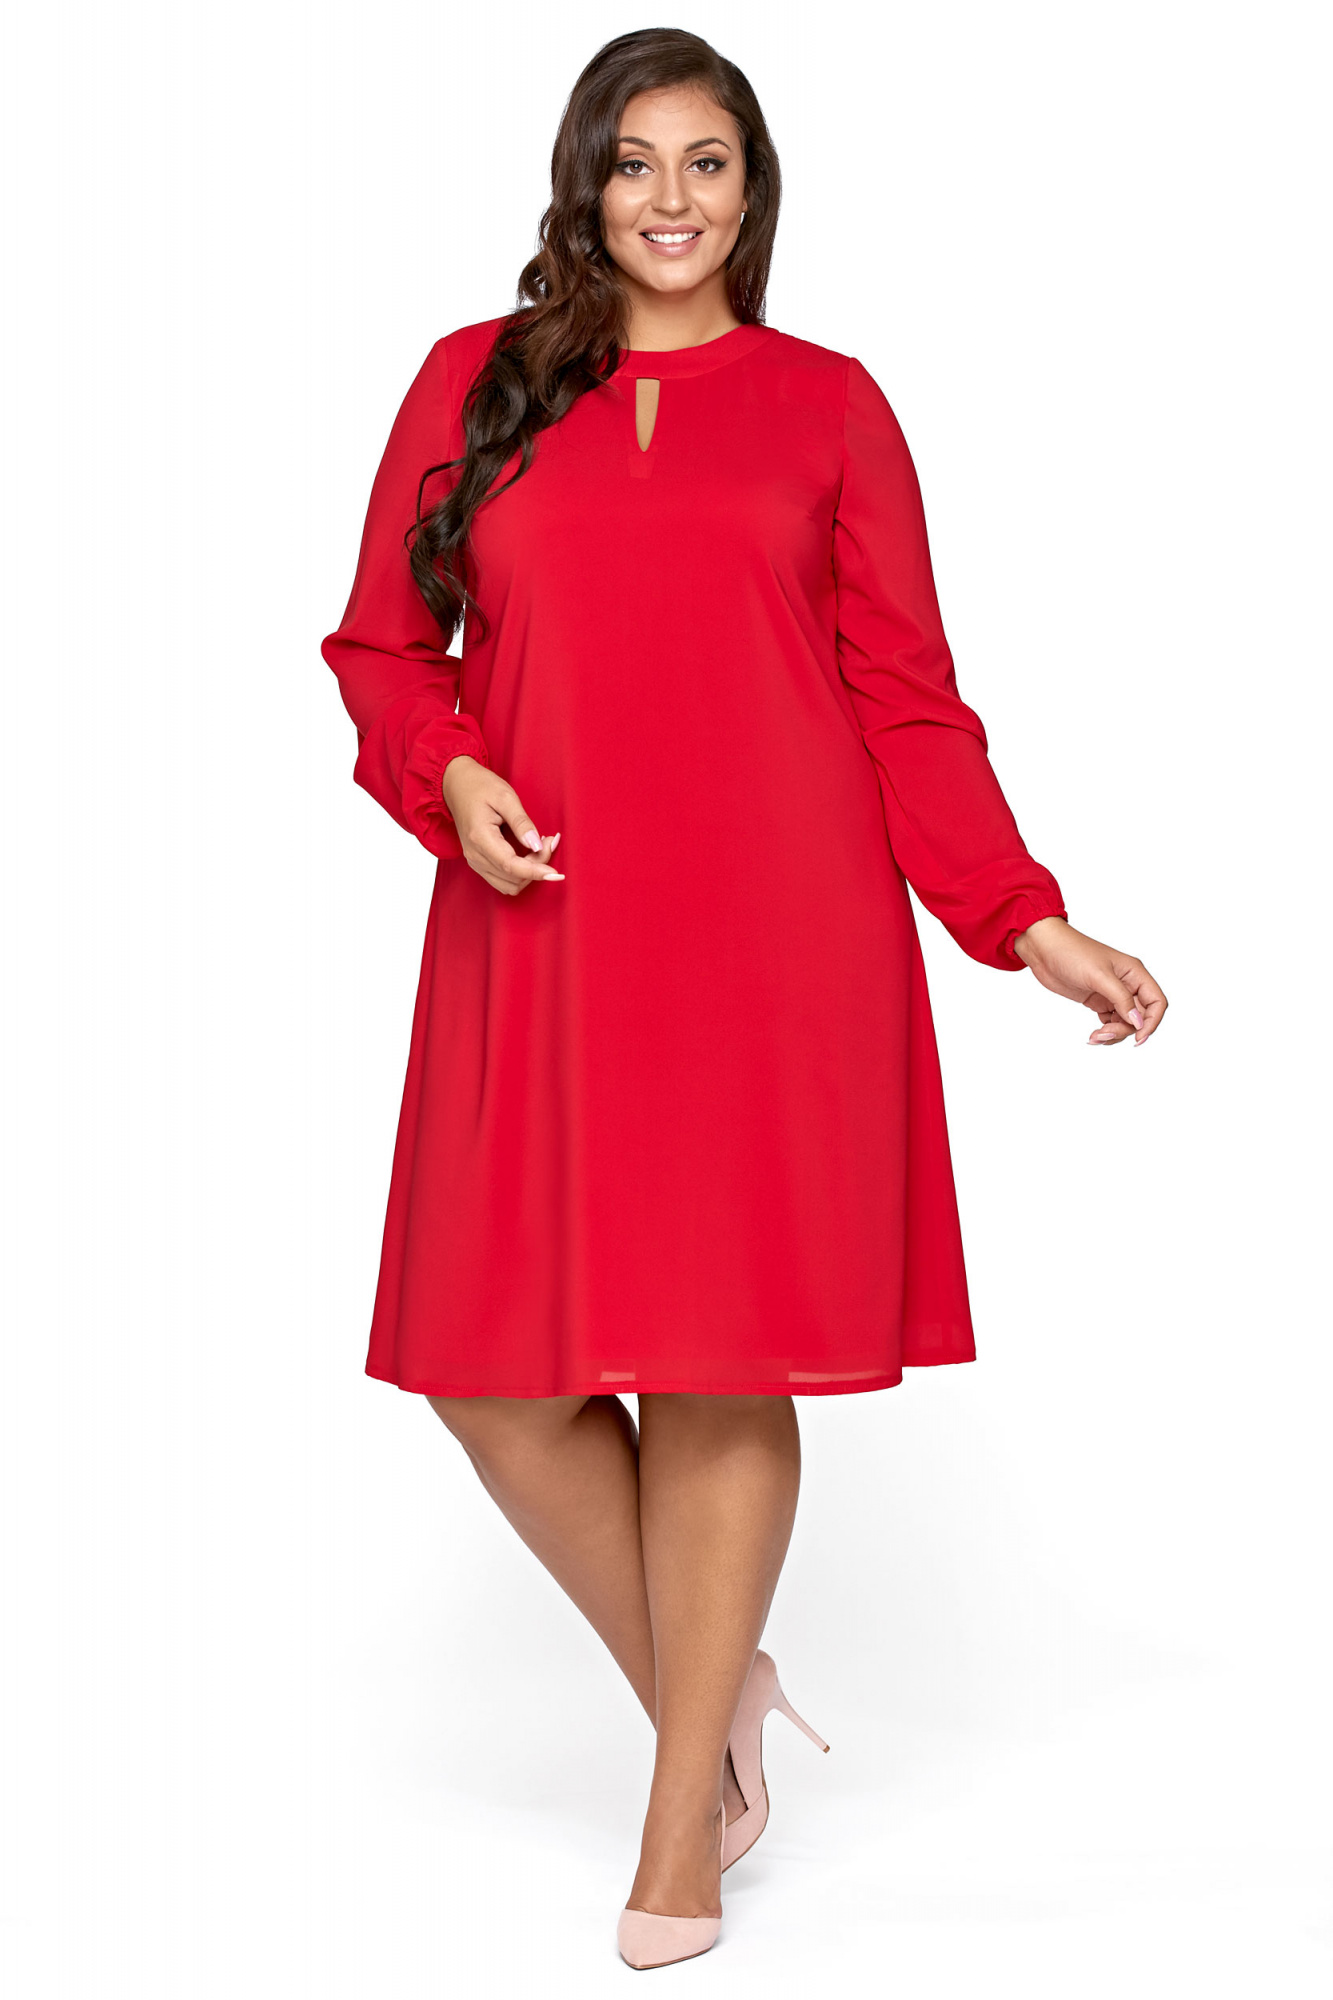 d4eccfc3 Lita- Trapezowa sukienka z szyfonu KM300-1PS - ❤ Kartes-Moda ❤